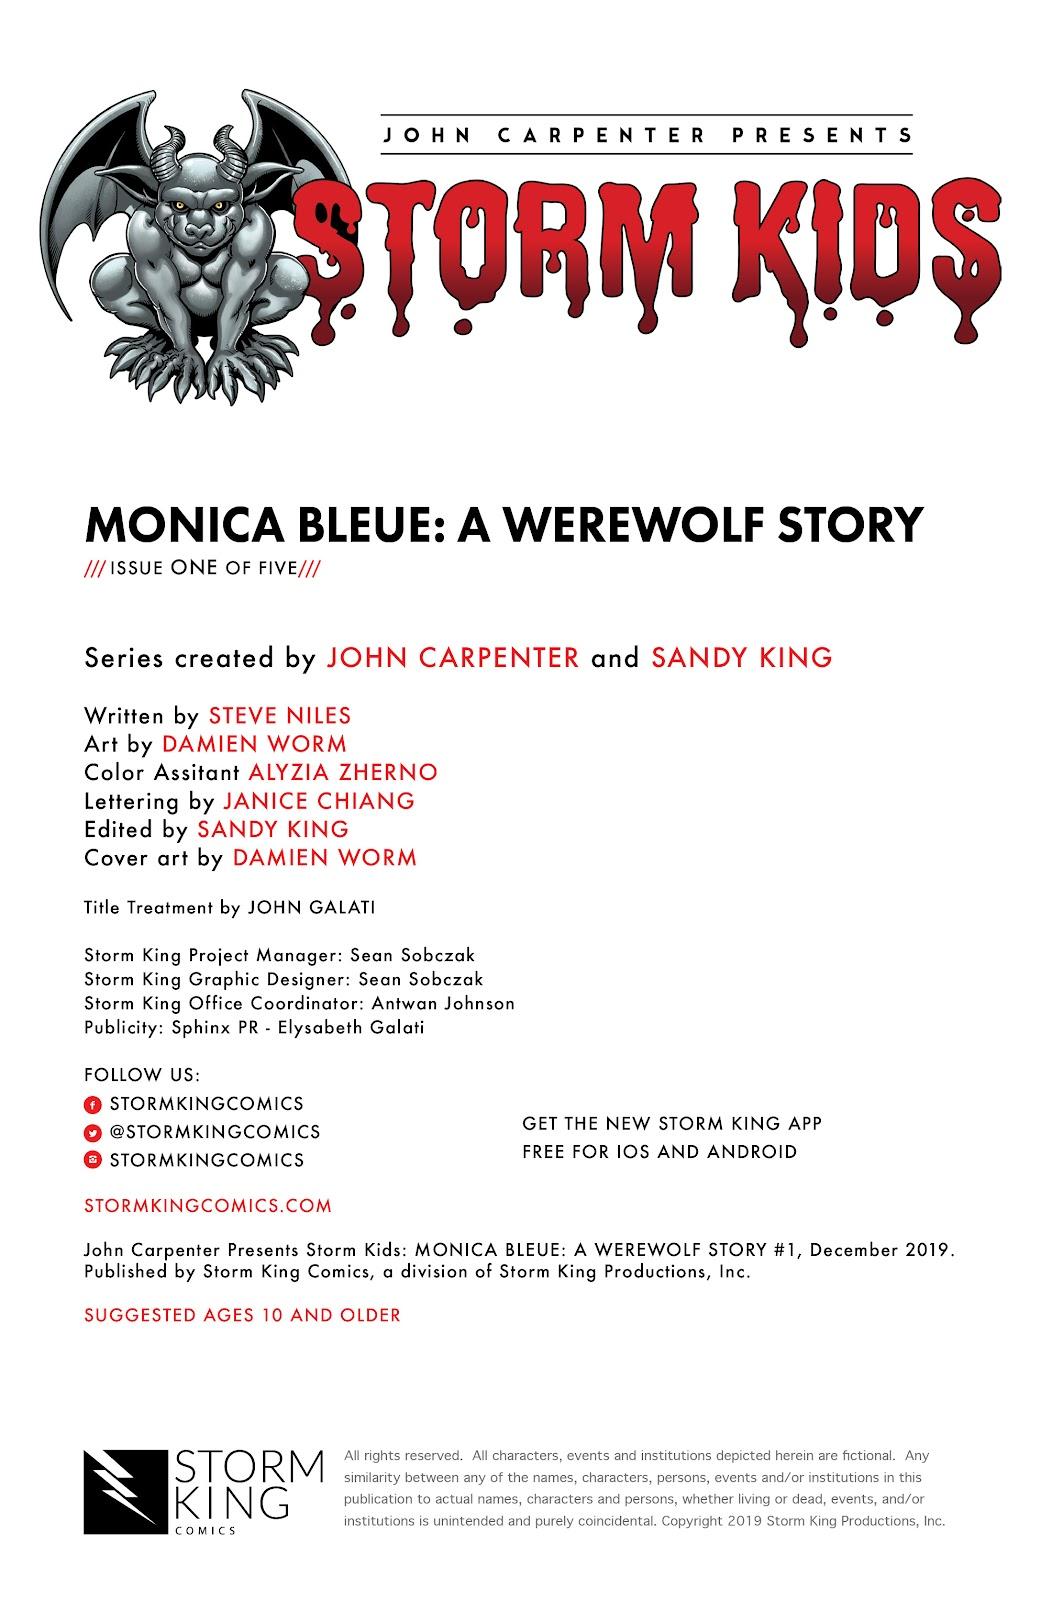 Read online John Carpenter Presents Storm Kids: Monica Bleue: A Werewolf Story comic -  Issue #1 - 2